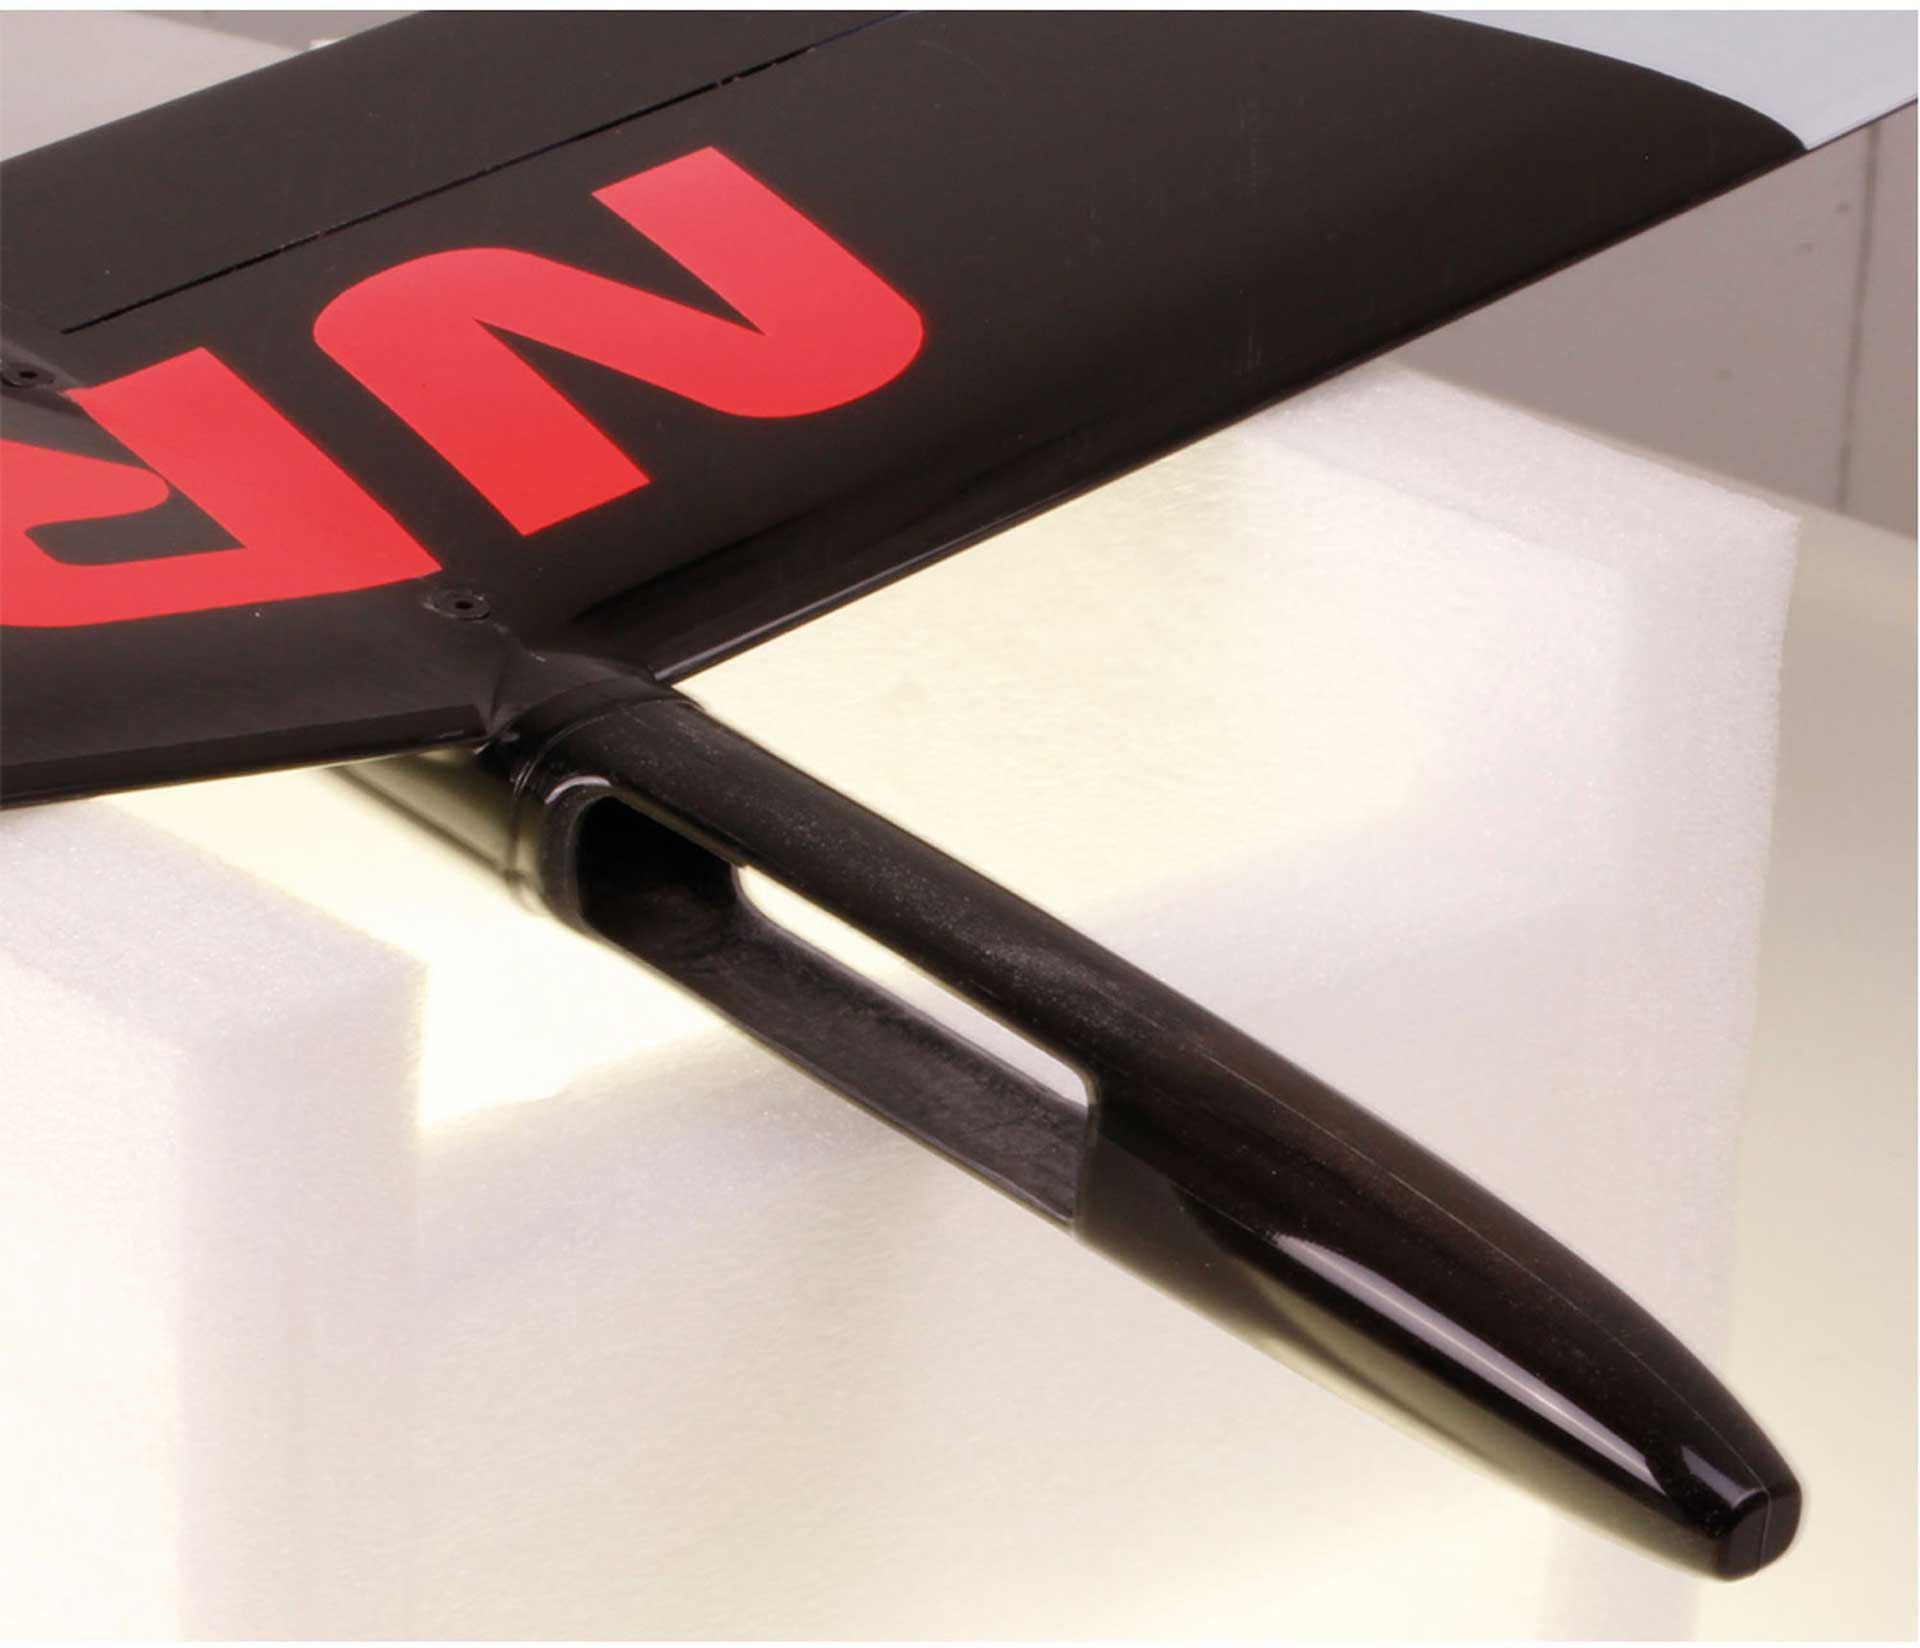 OA-COMPOSITES NRJ F3K RED# 2 CW40 CENTRIFUGAL GLIDER